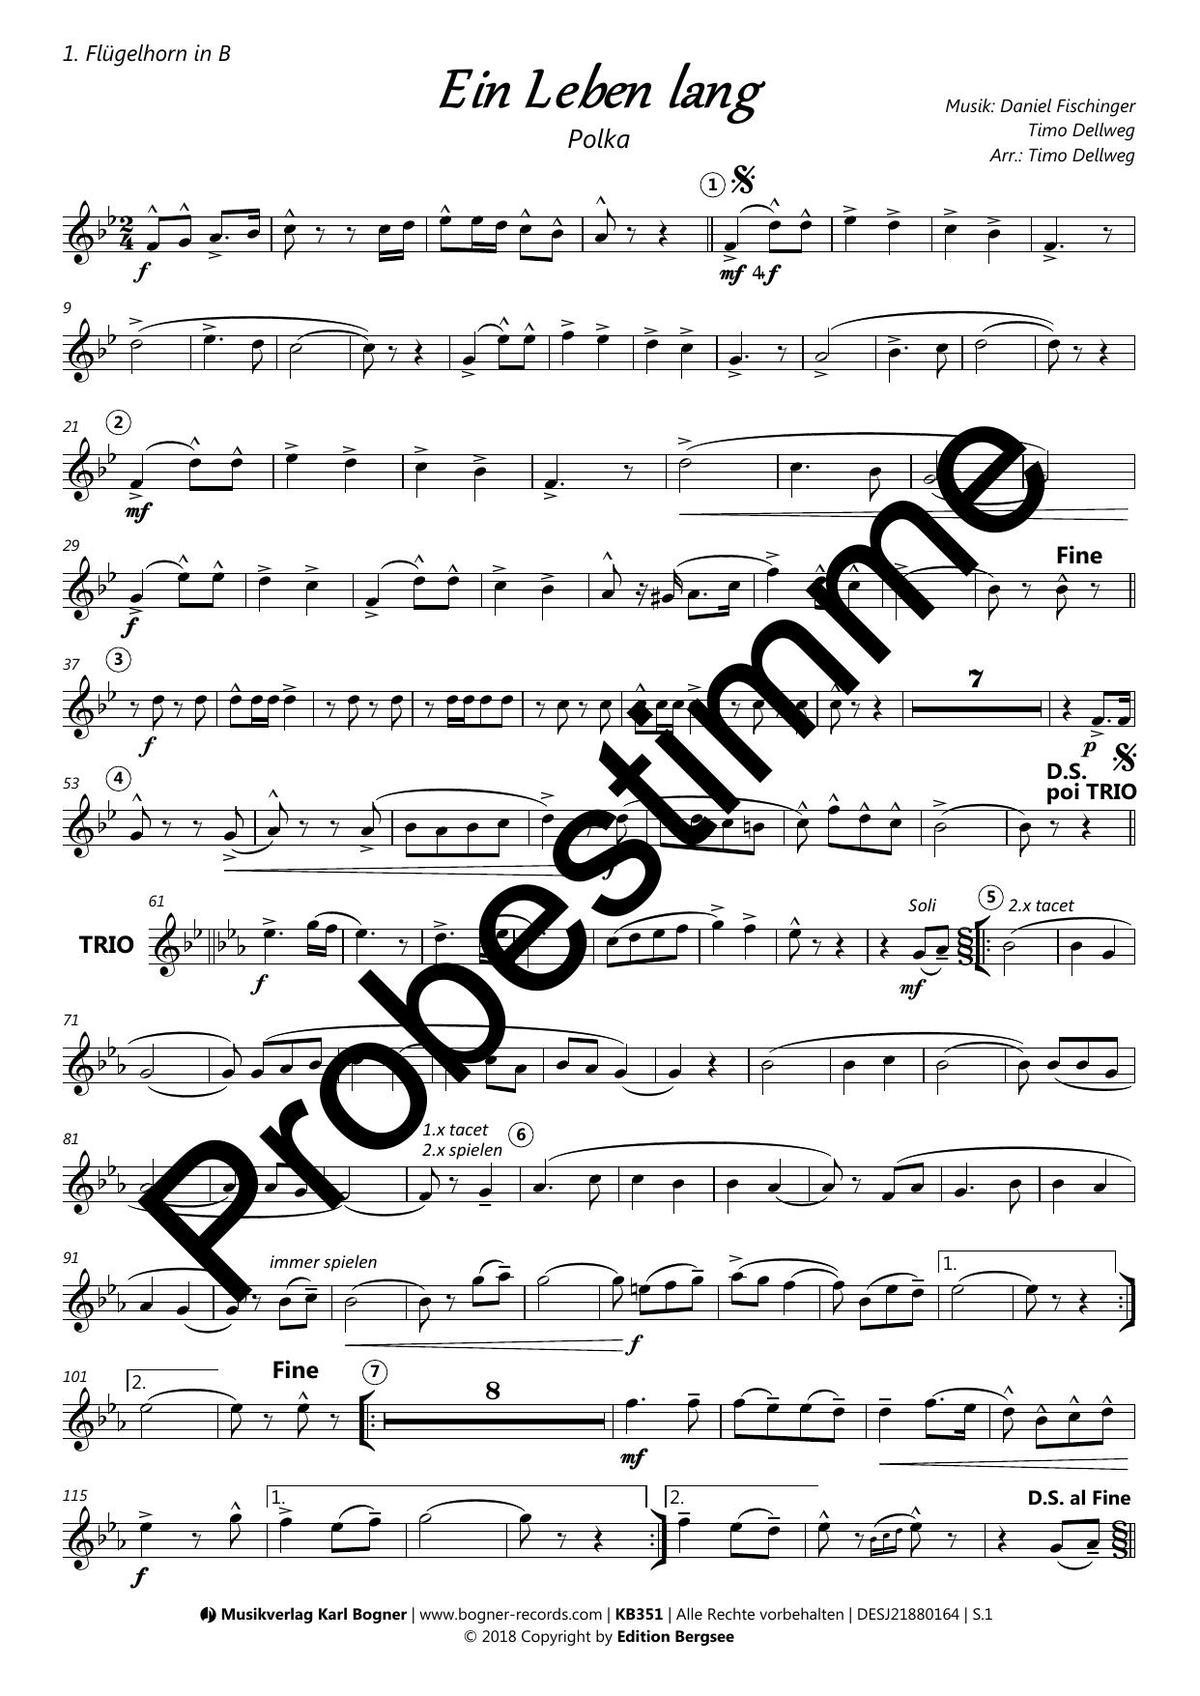 Ein Leben lang (Polka) | Noten - Polkas | Timo Dellweg